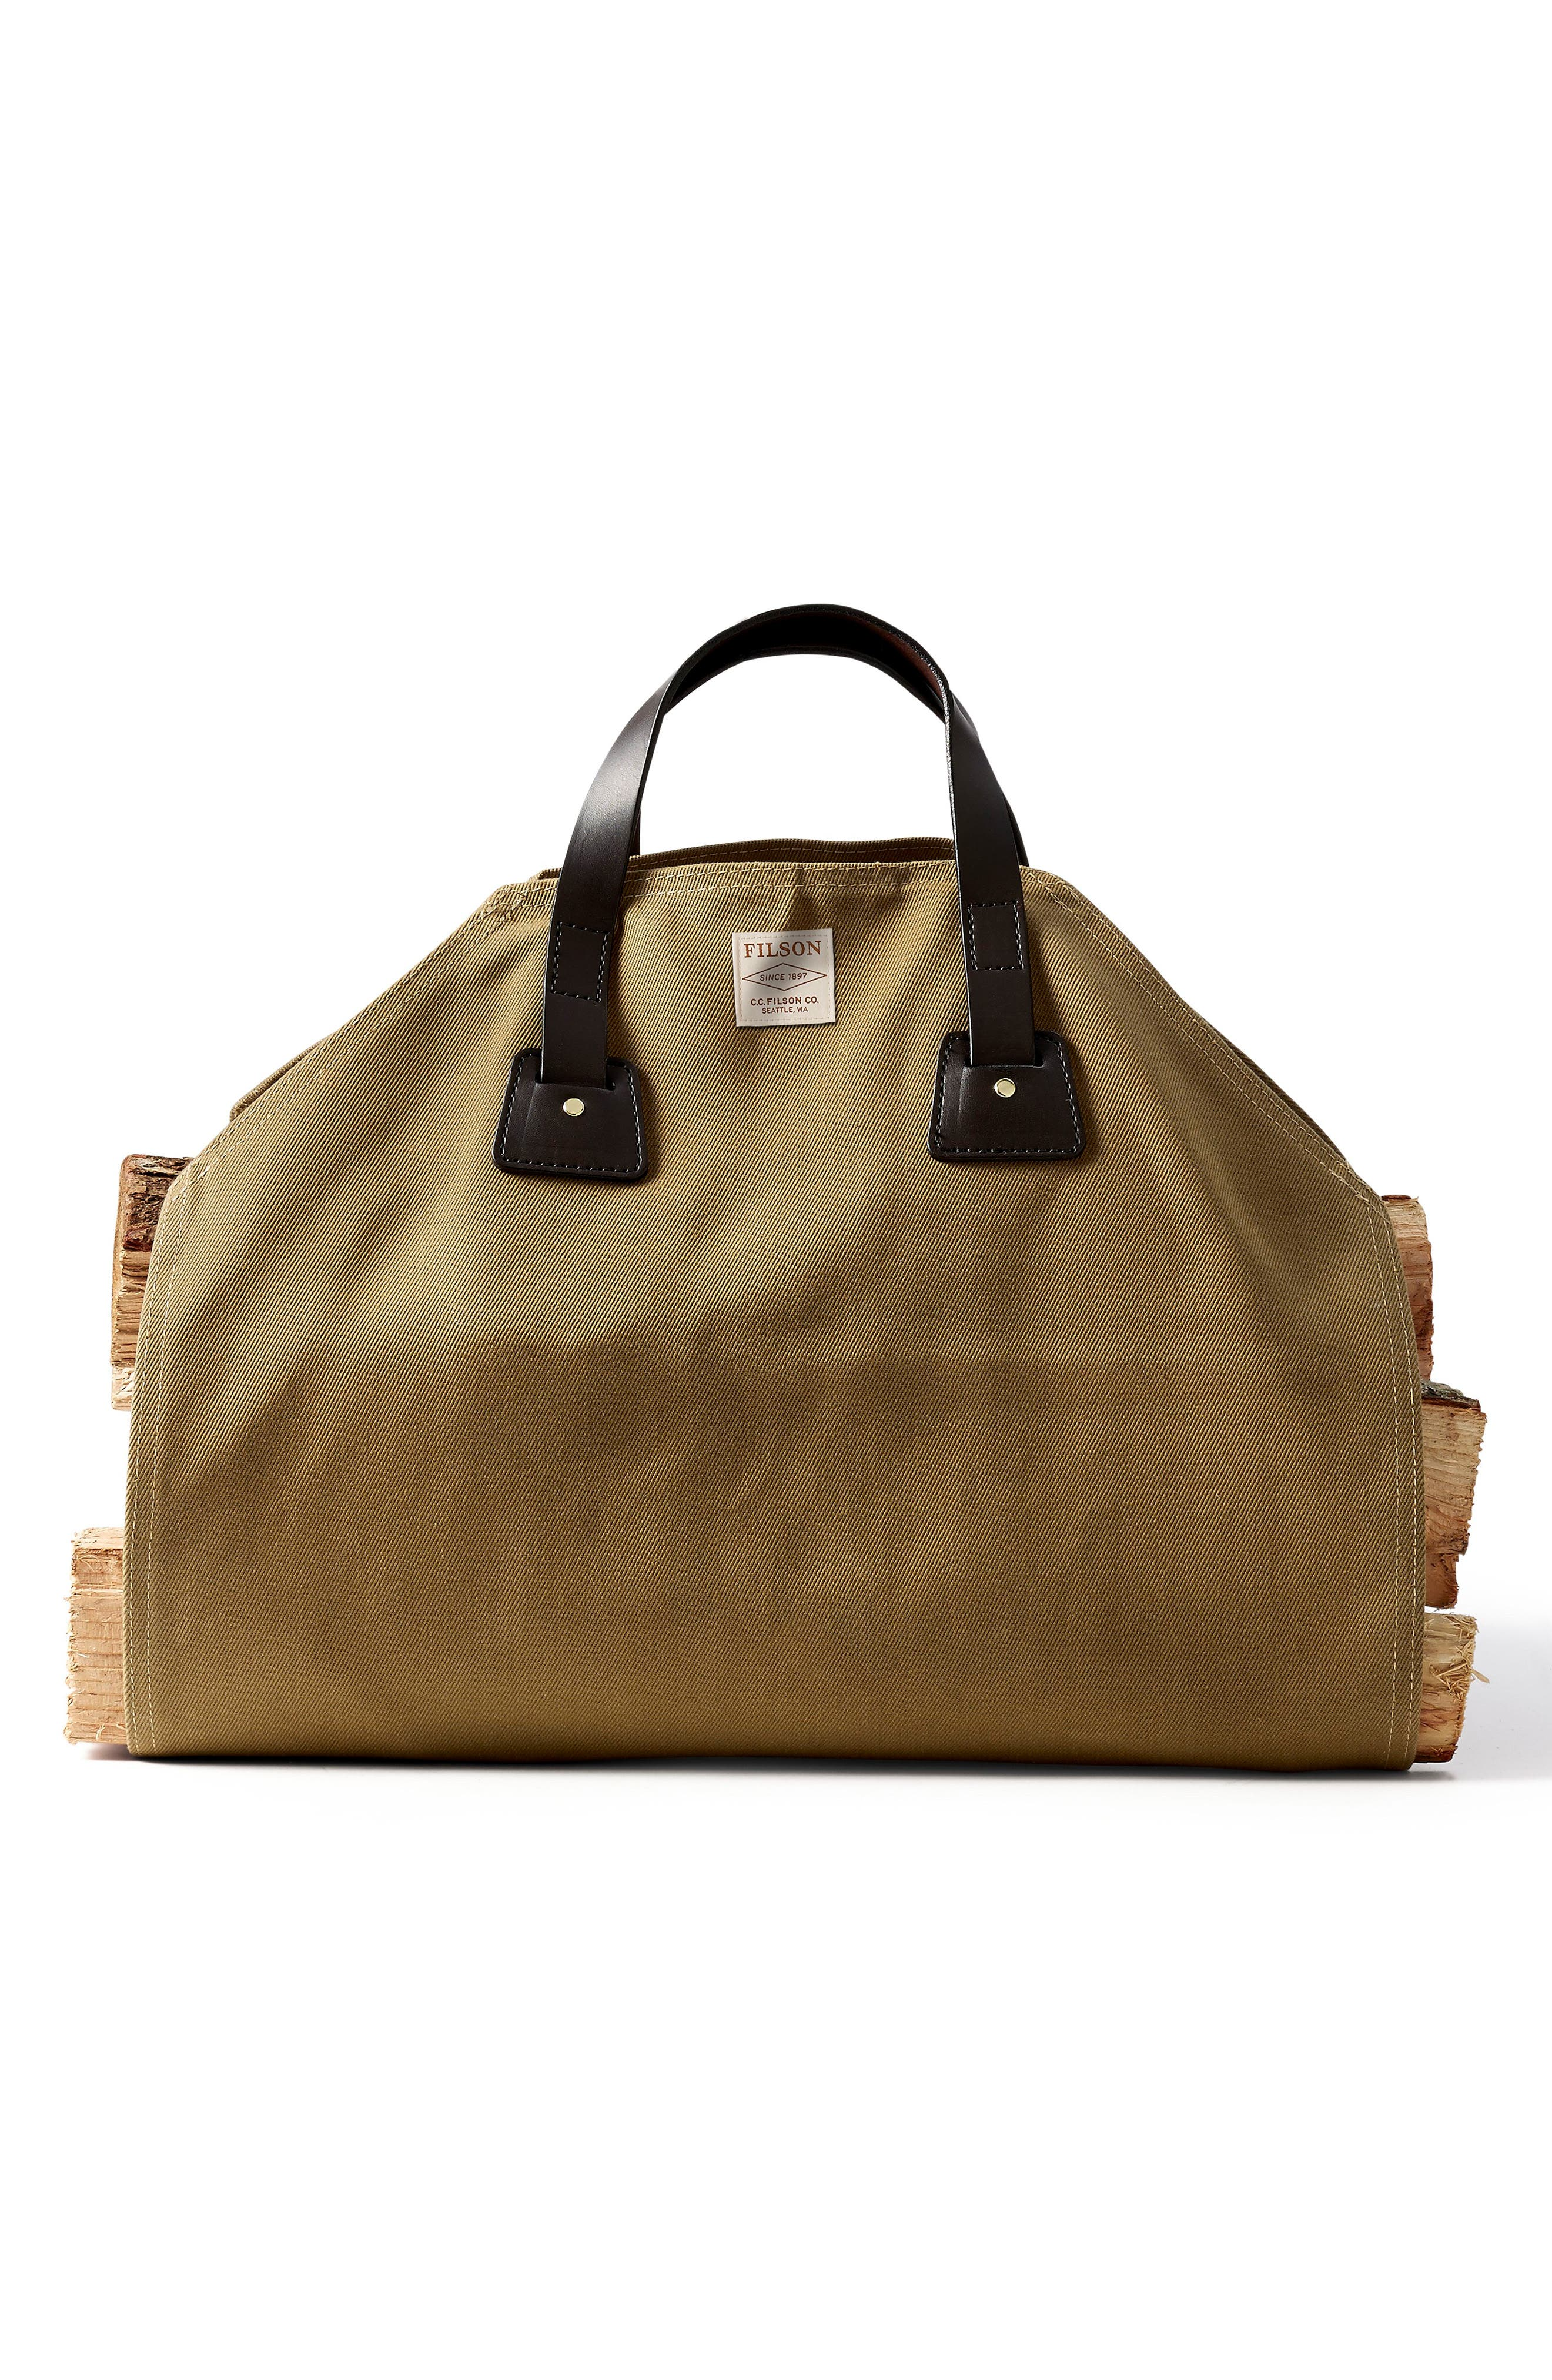 Log Carrier,                         Main,                         color, Tan